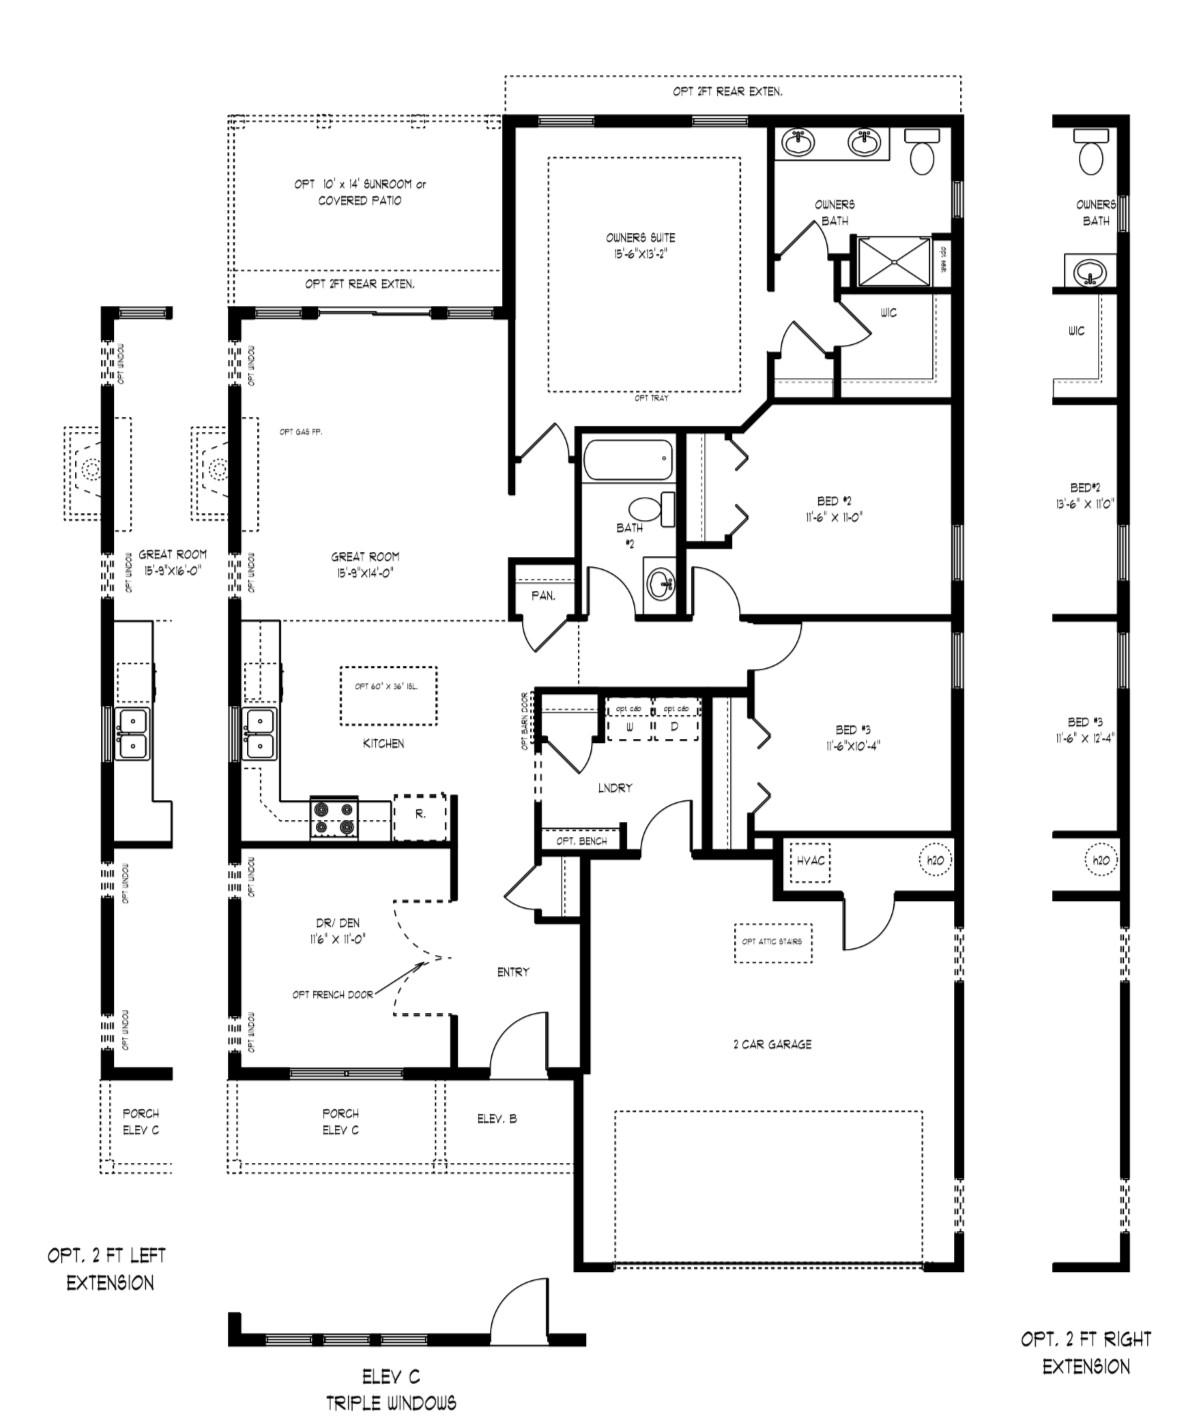 revised-1st-floor-7.19.19